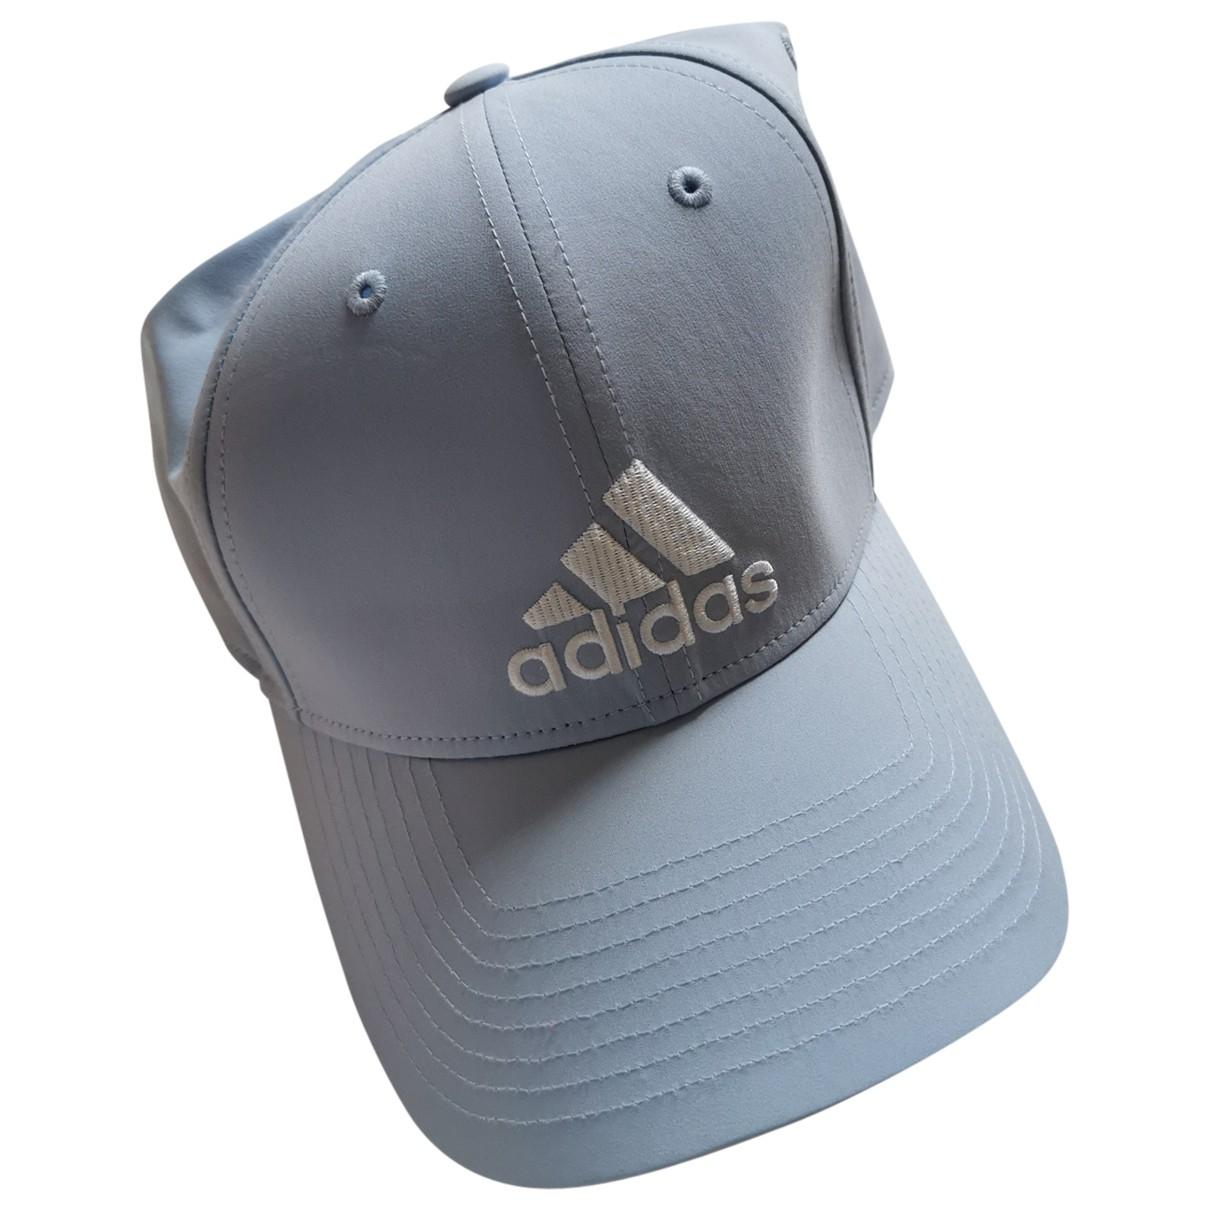 Adidas \N Blue Cotton hat for Women M International